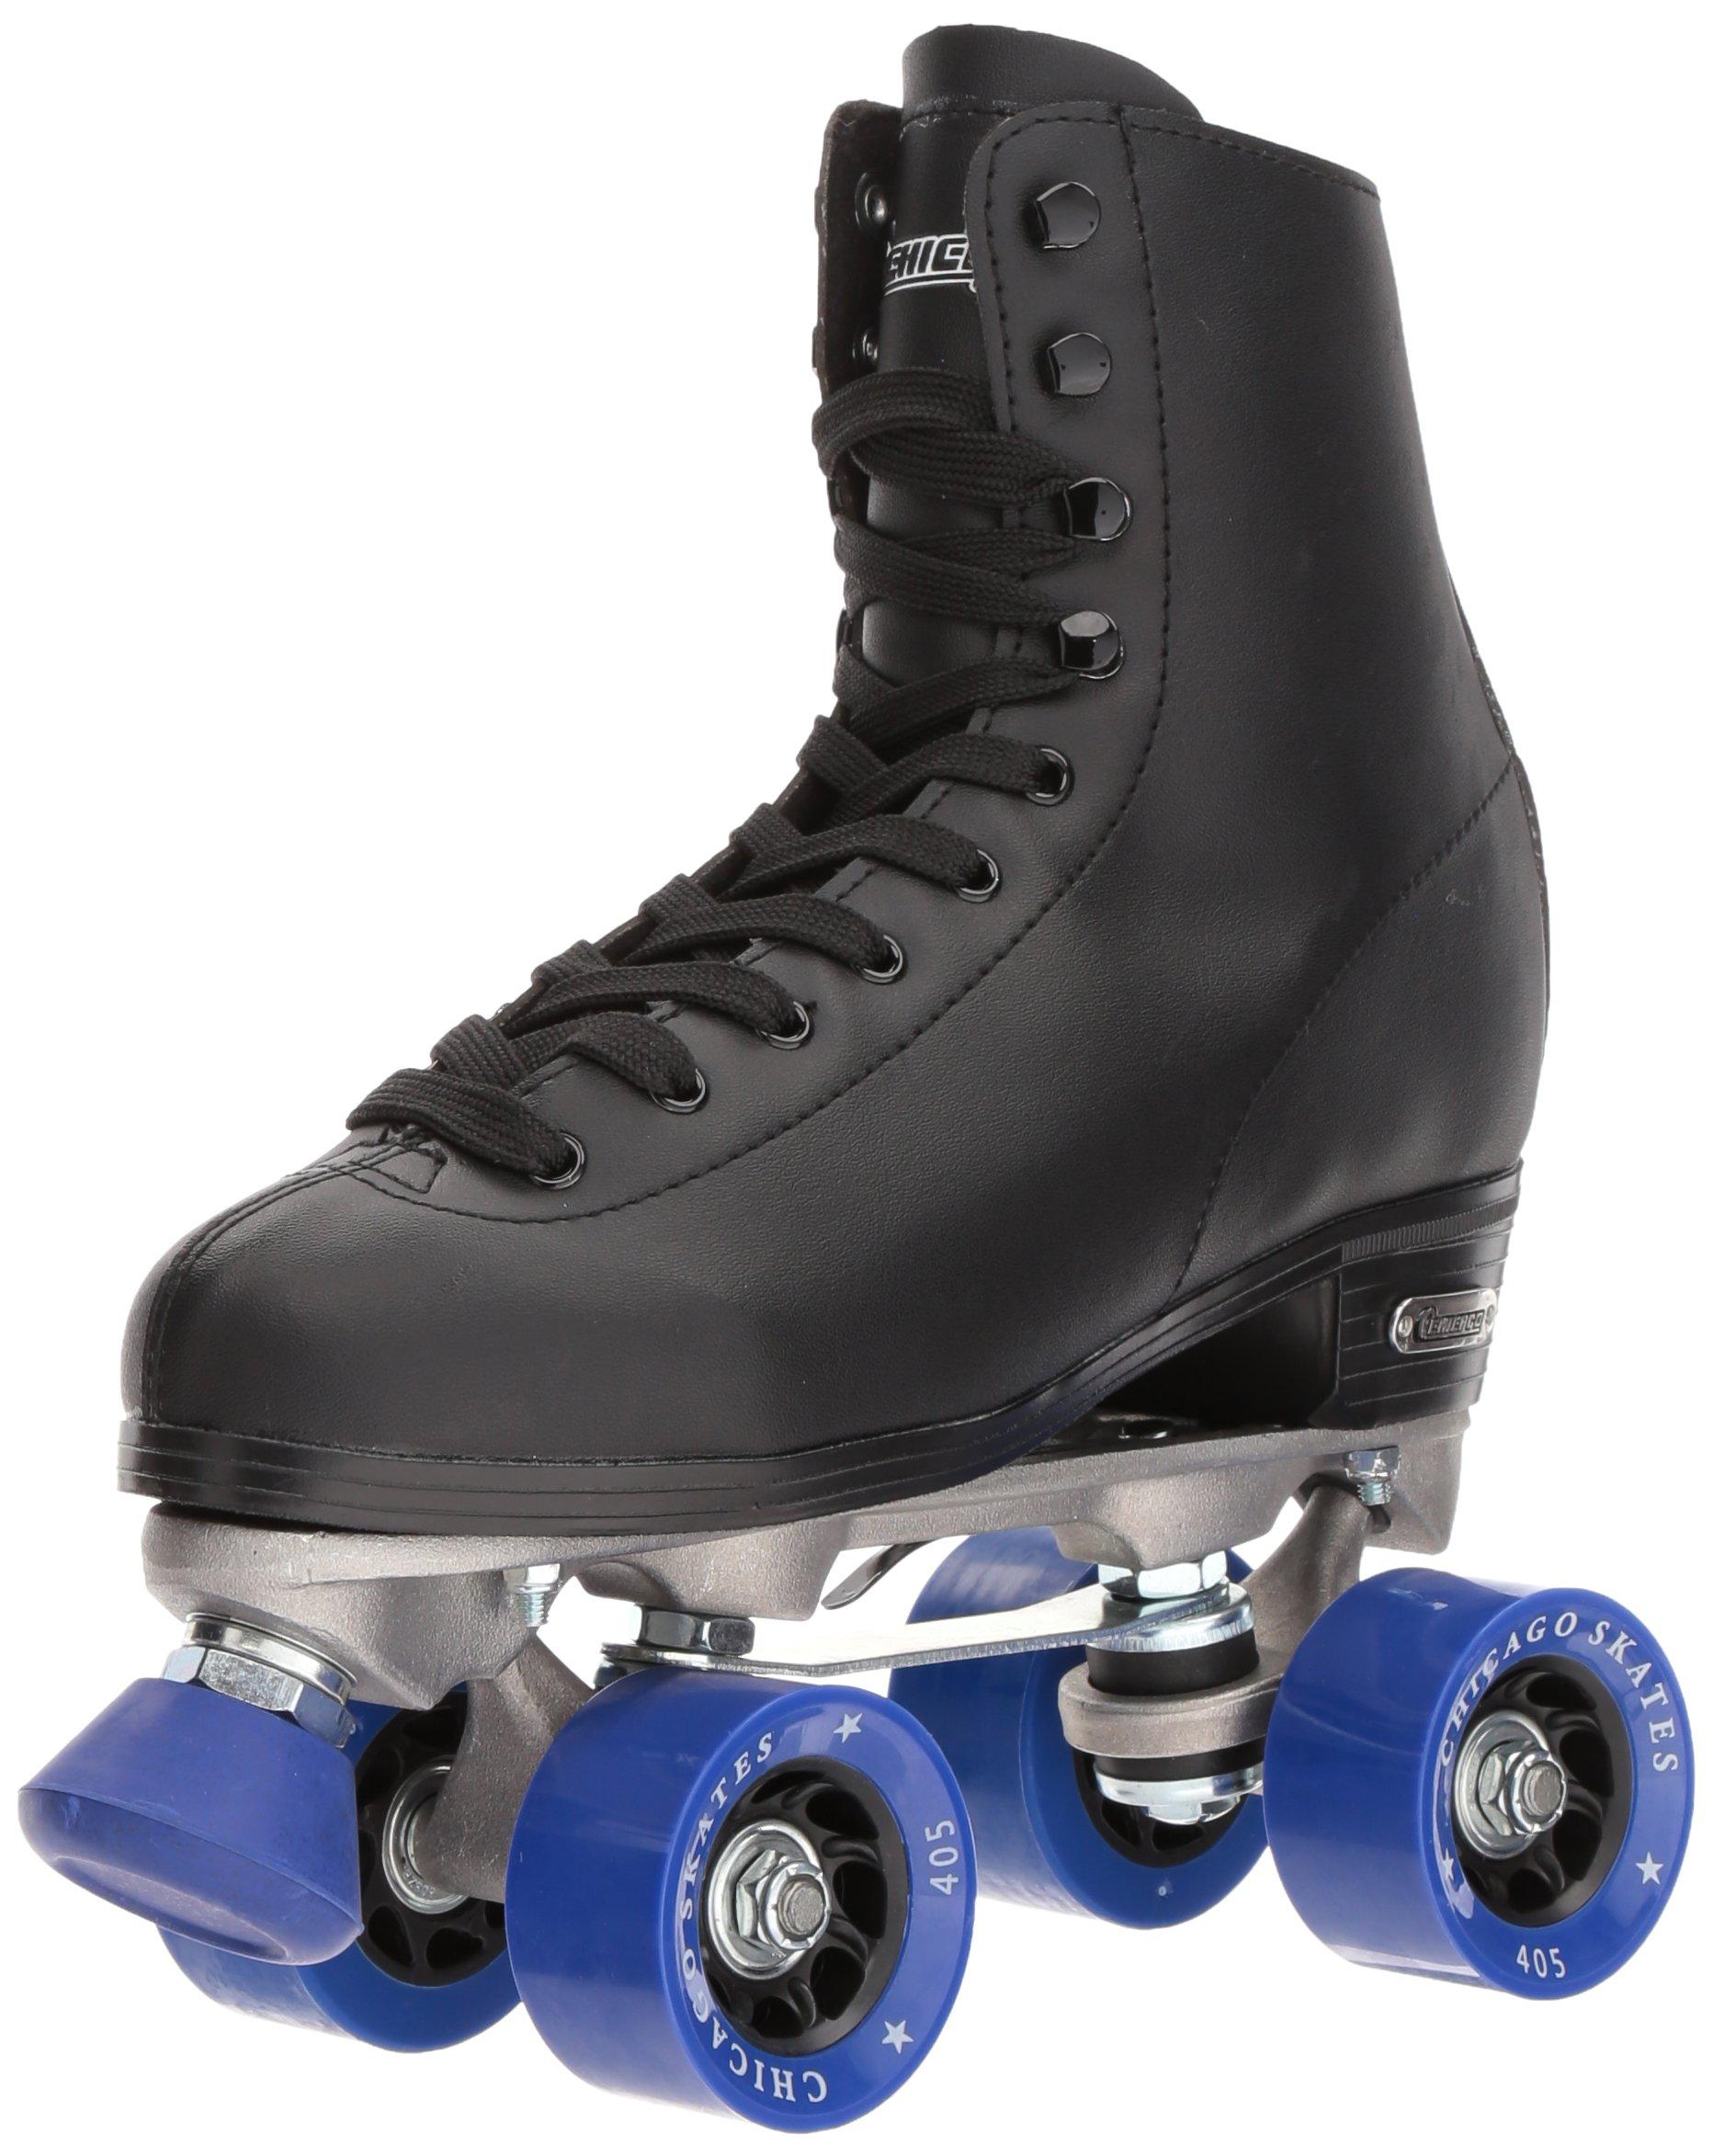 Chicago Men's Classic Roller Skates - Premium Black Quad Rink Skates - Size 11 by Chicago Skates